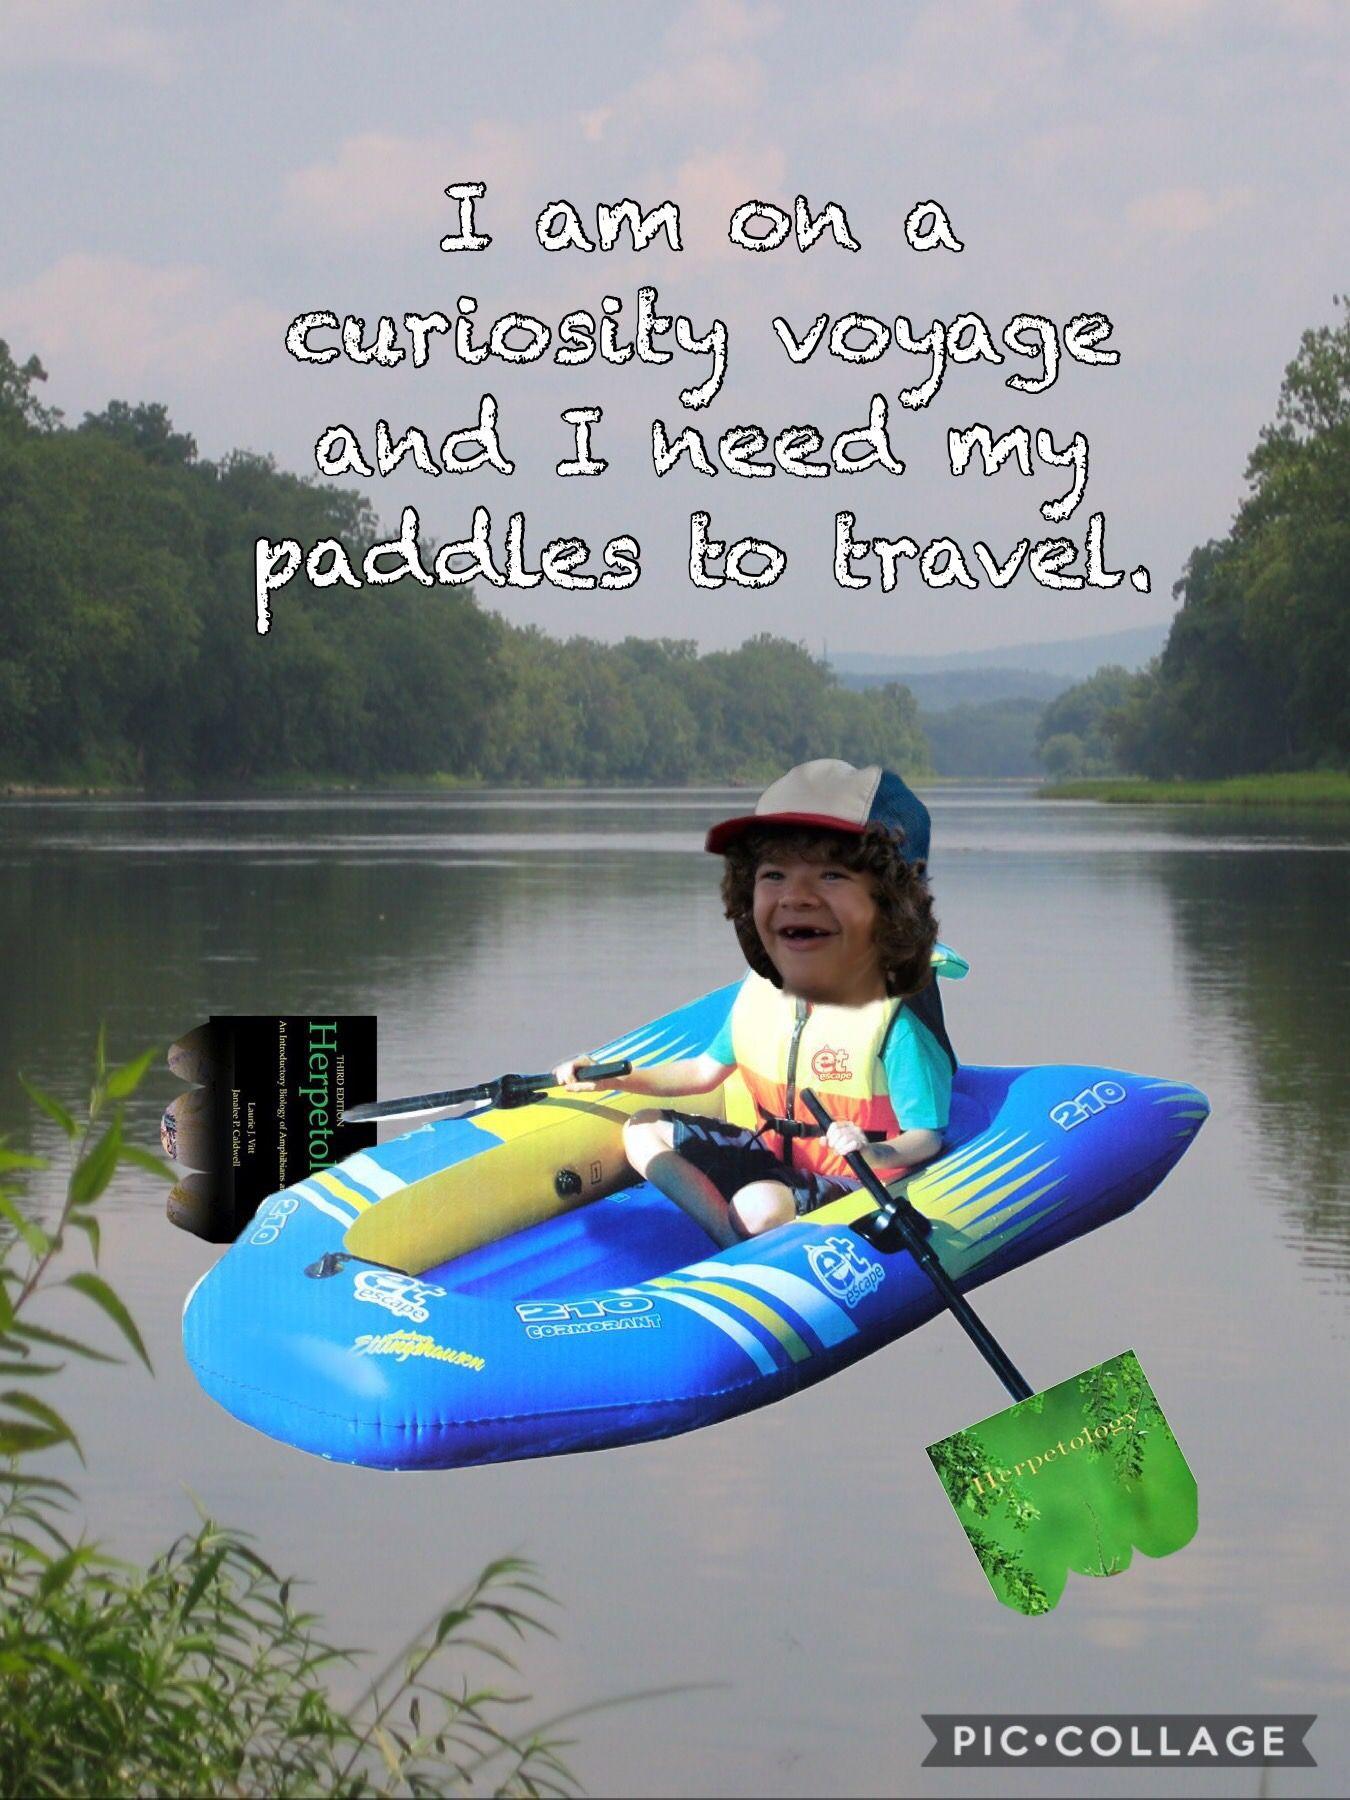 Dustin Curiosity Voyage Stranger Things Funny (Im Sorry I Did